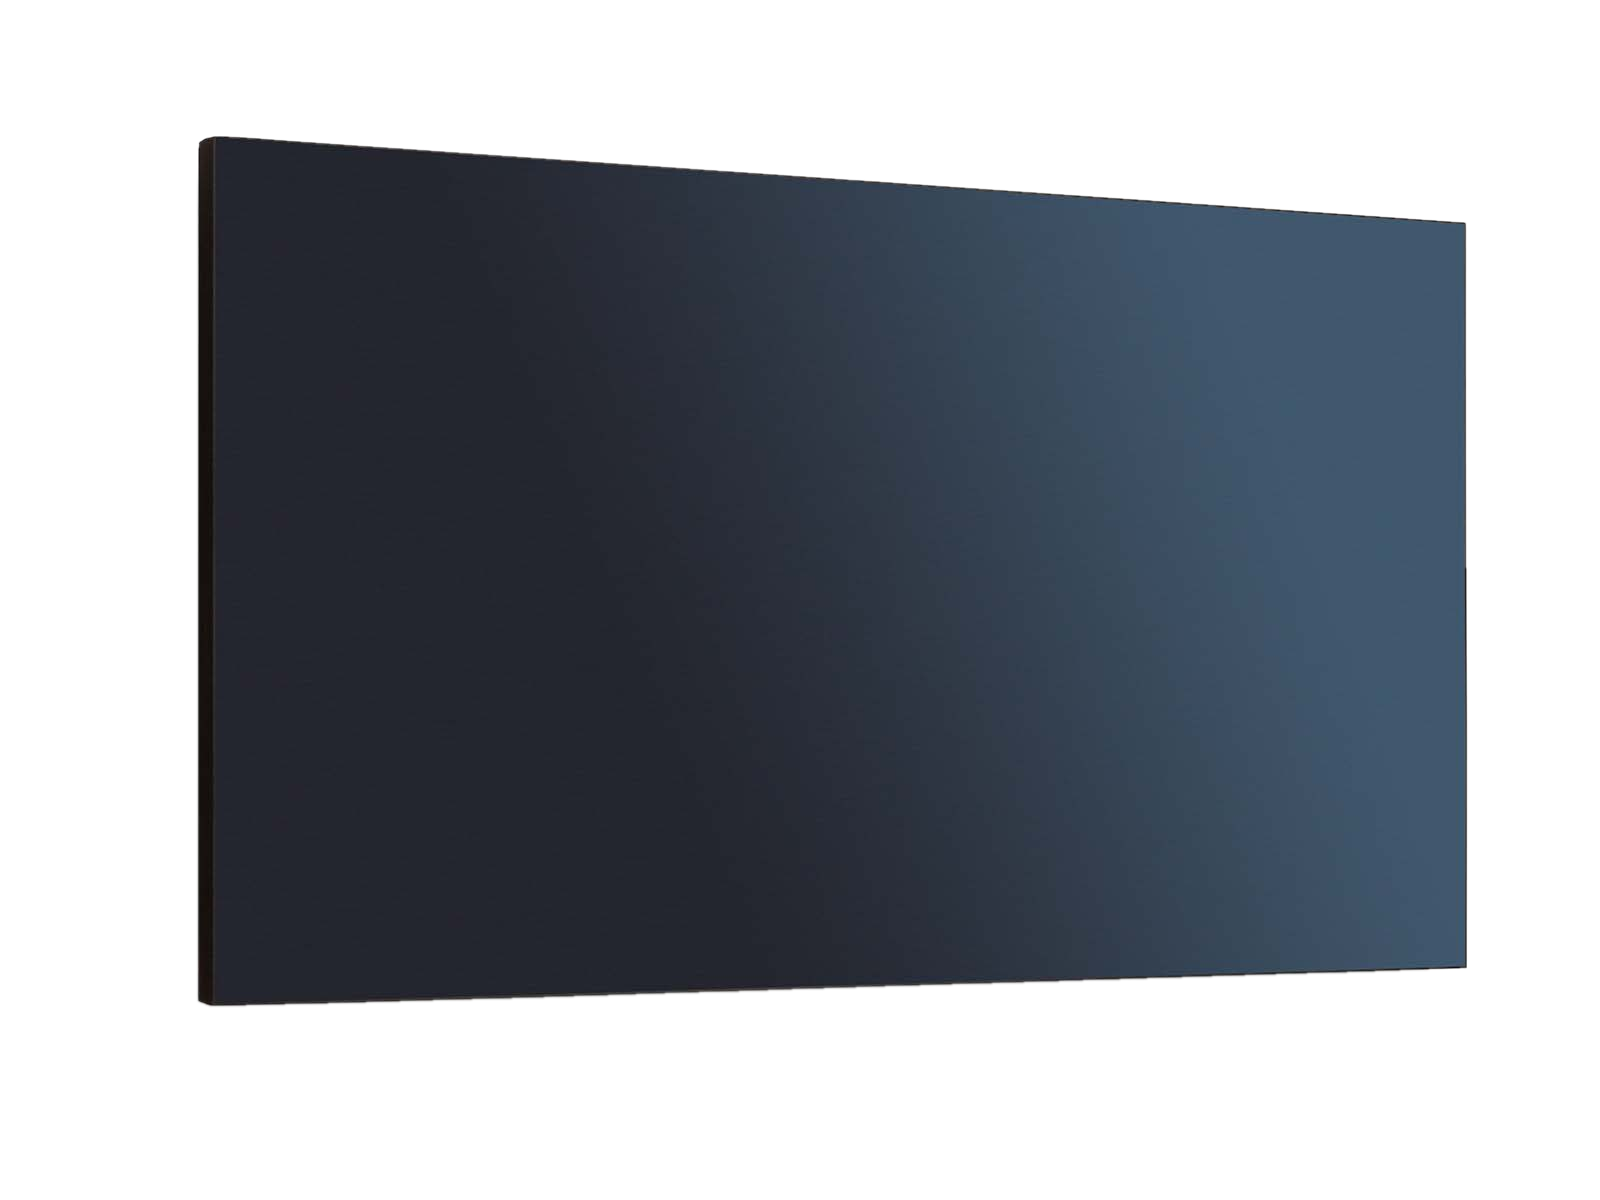 UN551S_Rt_RGB